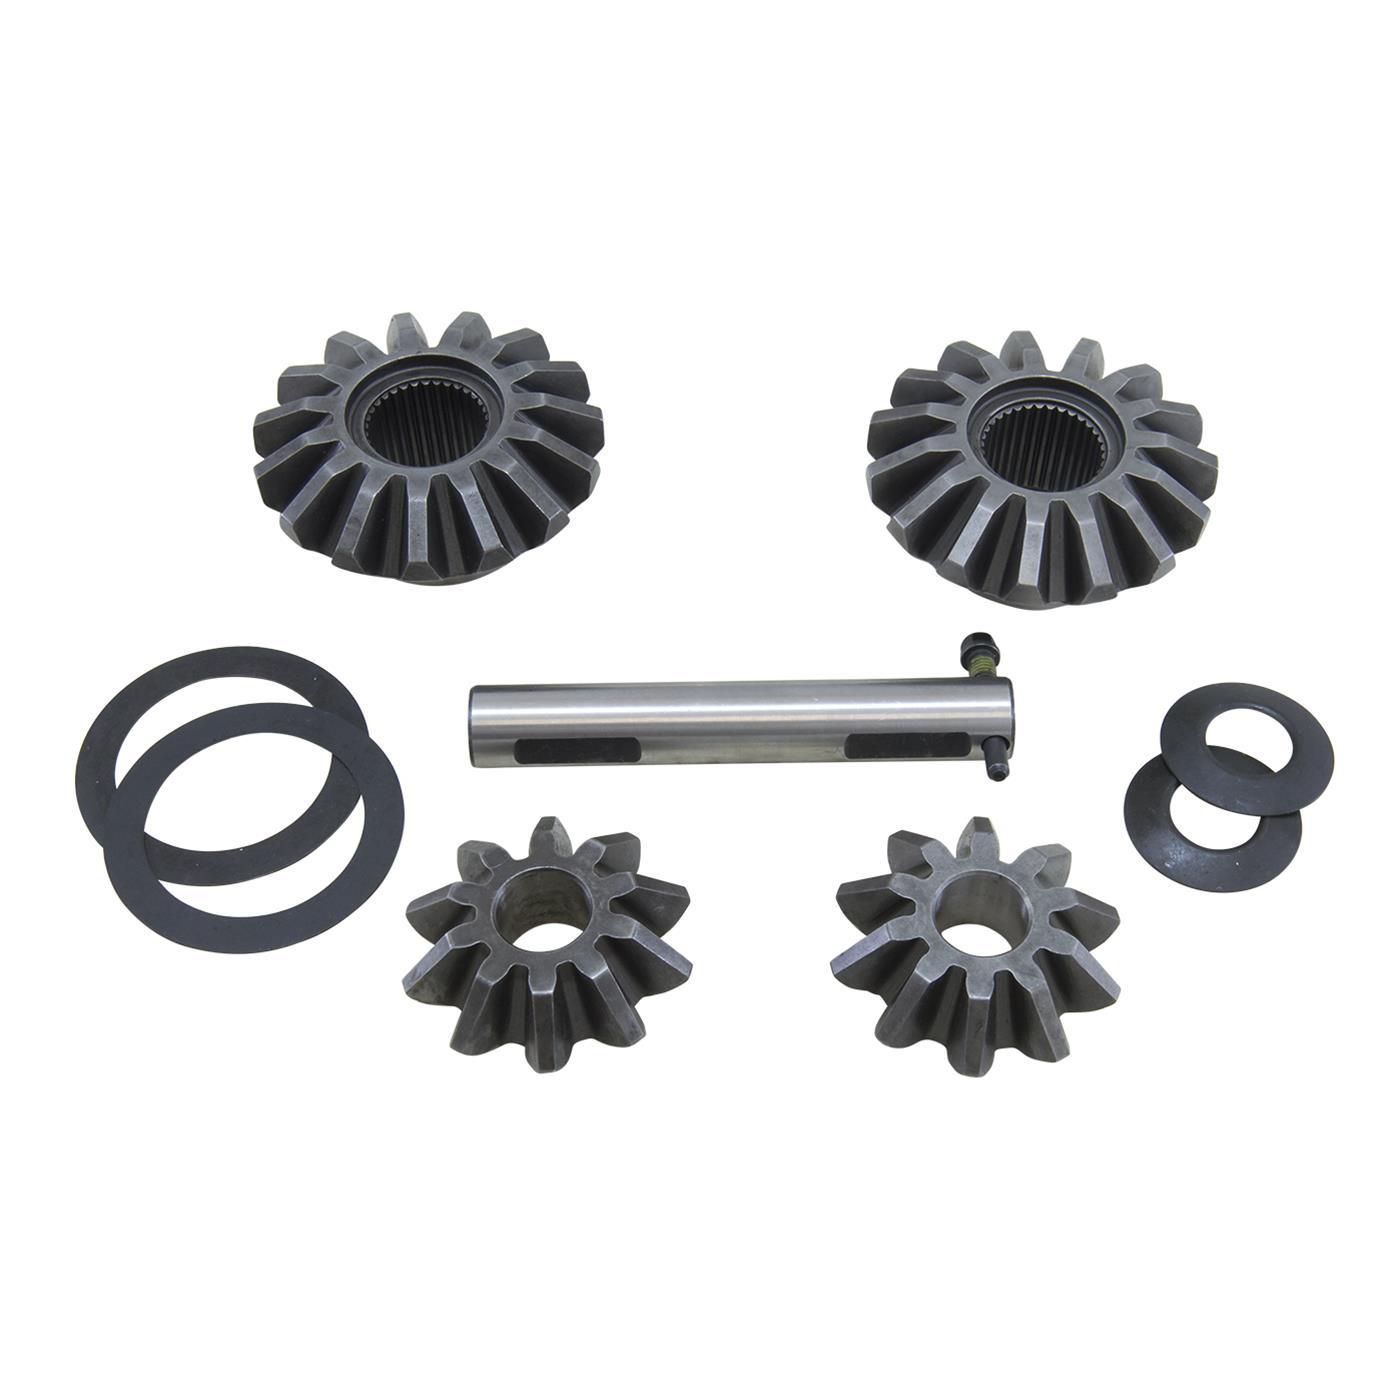 ZIKF8.8-S-31 Spider Gear Set for Ford 31-Spline 8.8 Differential USA Standard Gear